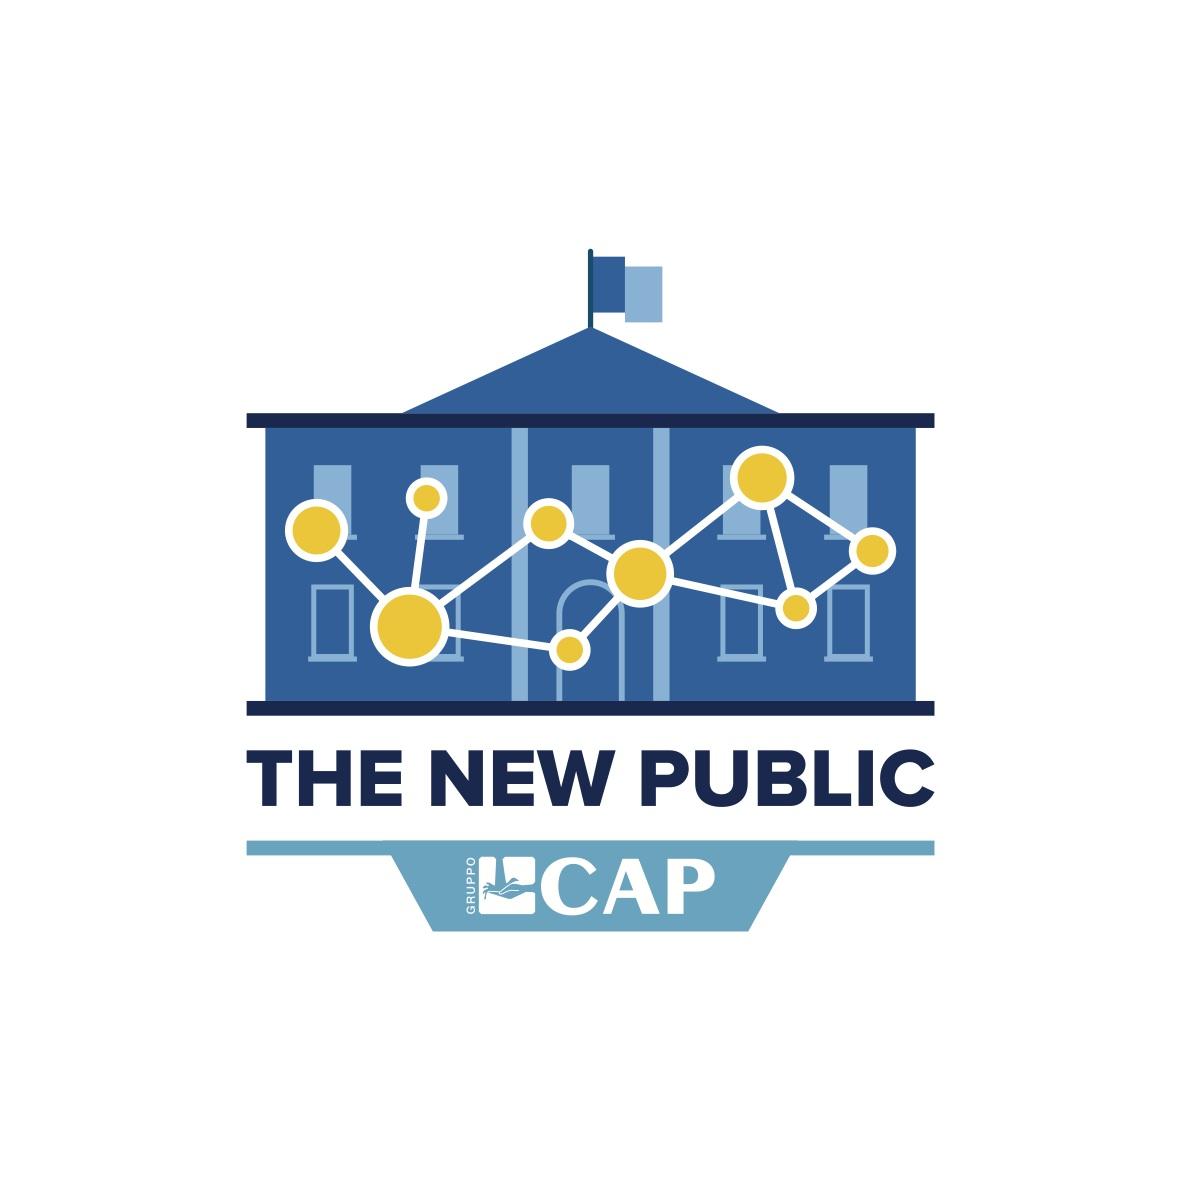 CAP – The new public